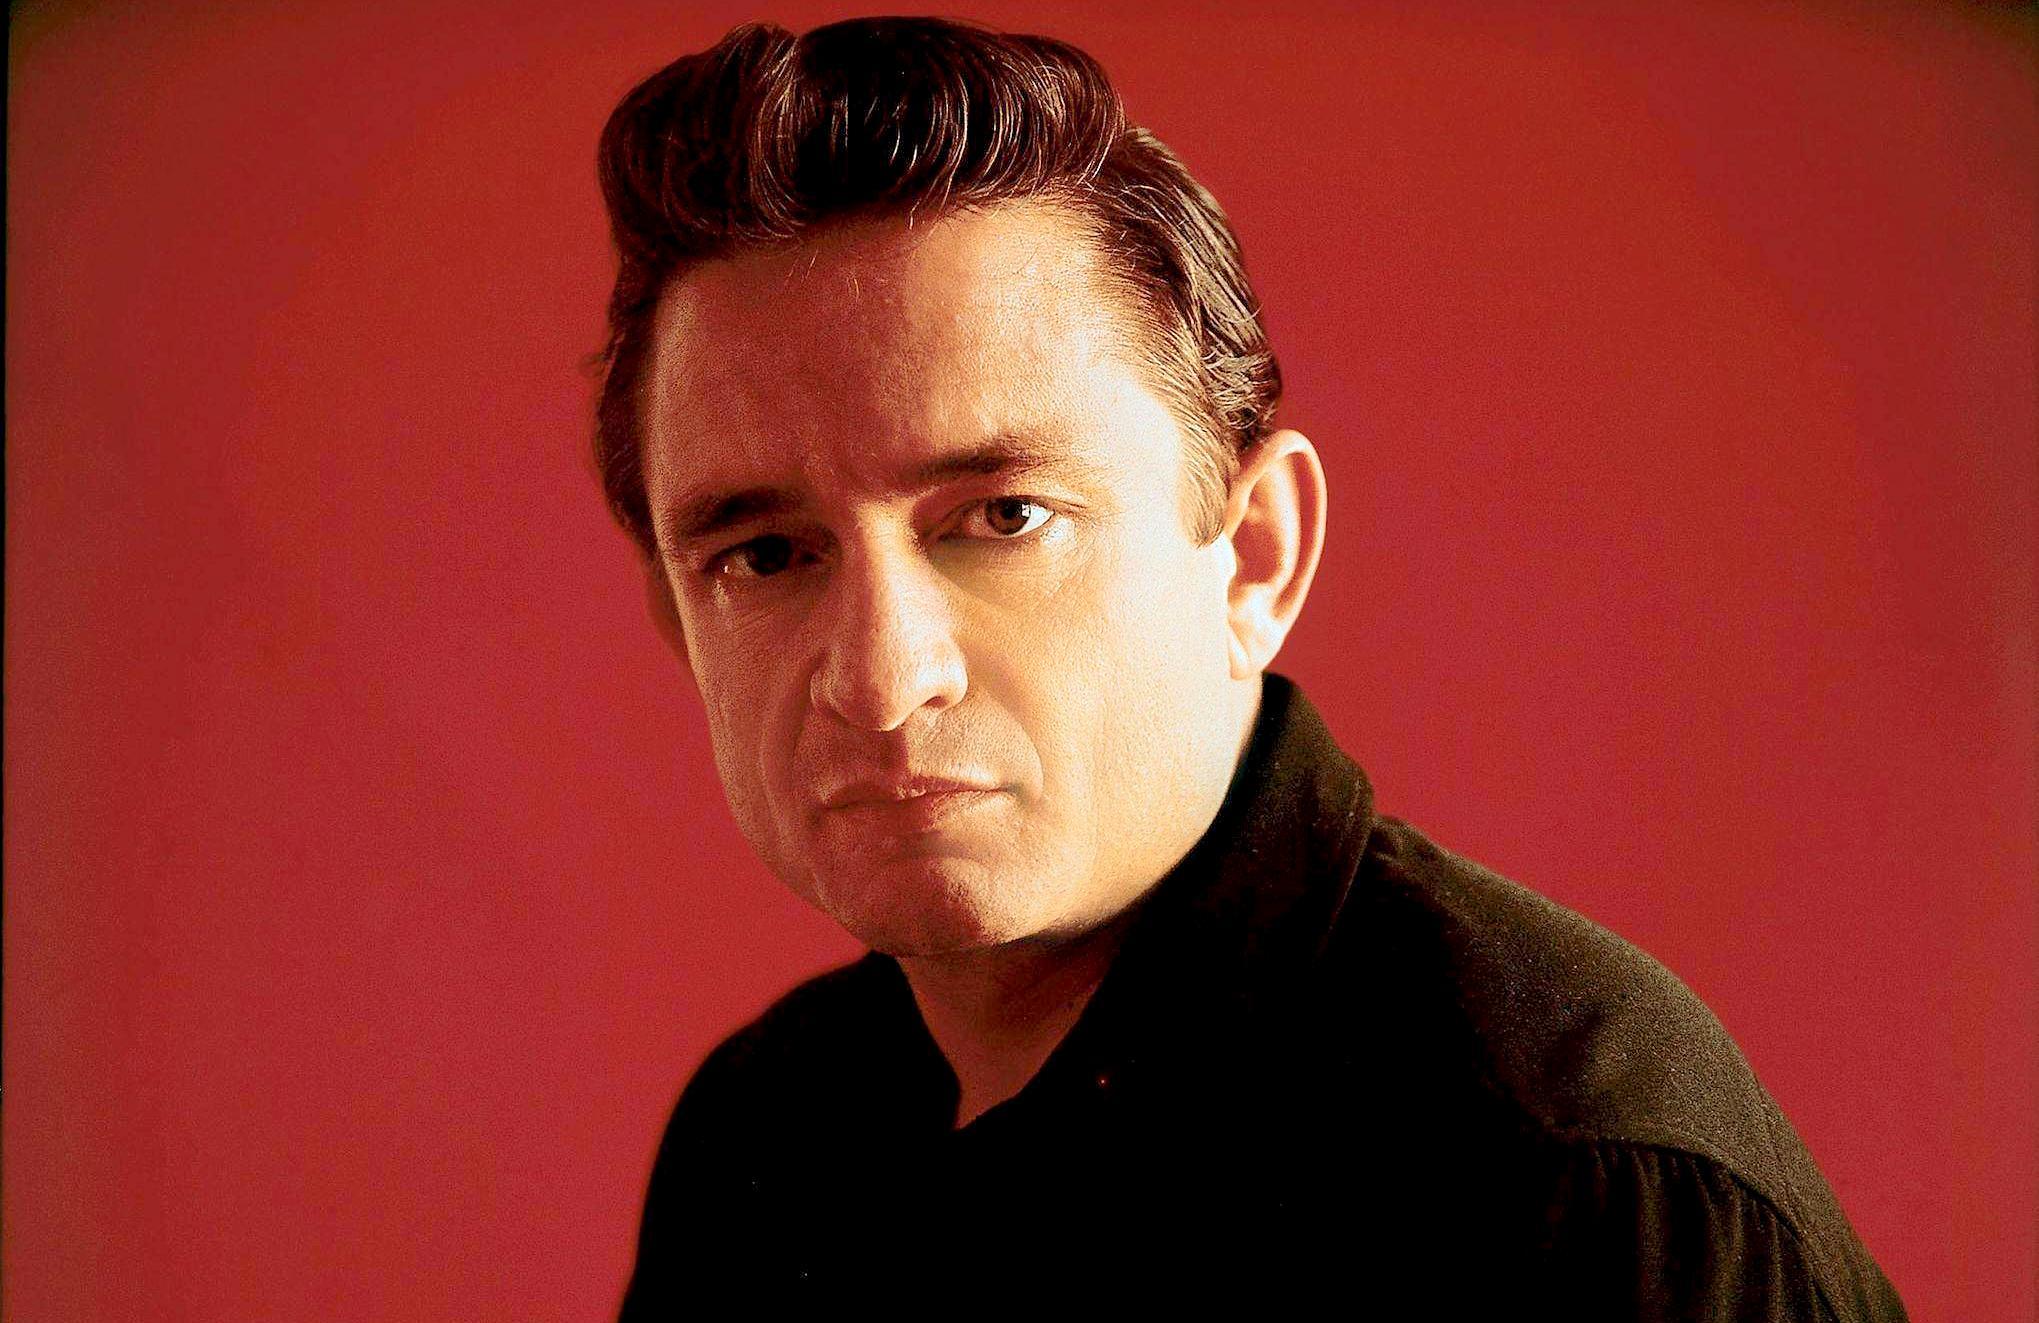 Singer-songwriter Johnny Cash - age: 71